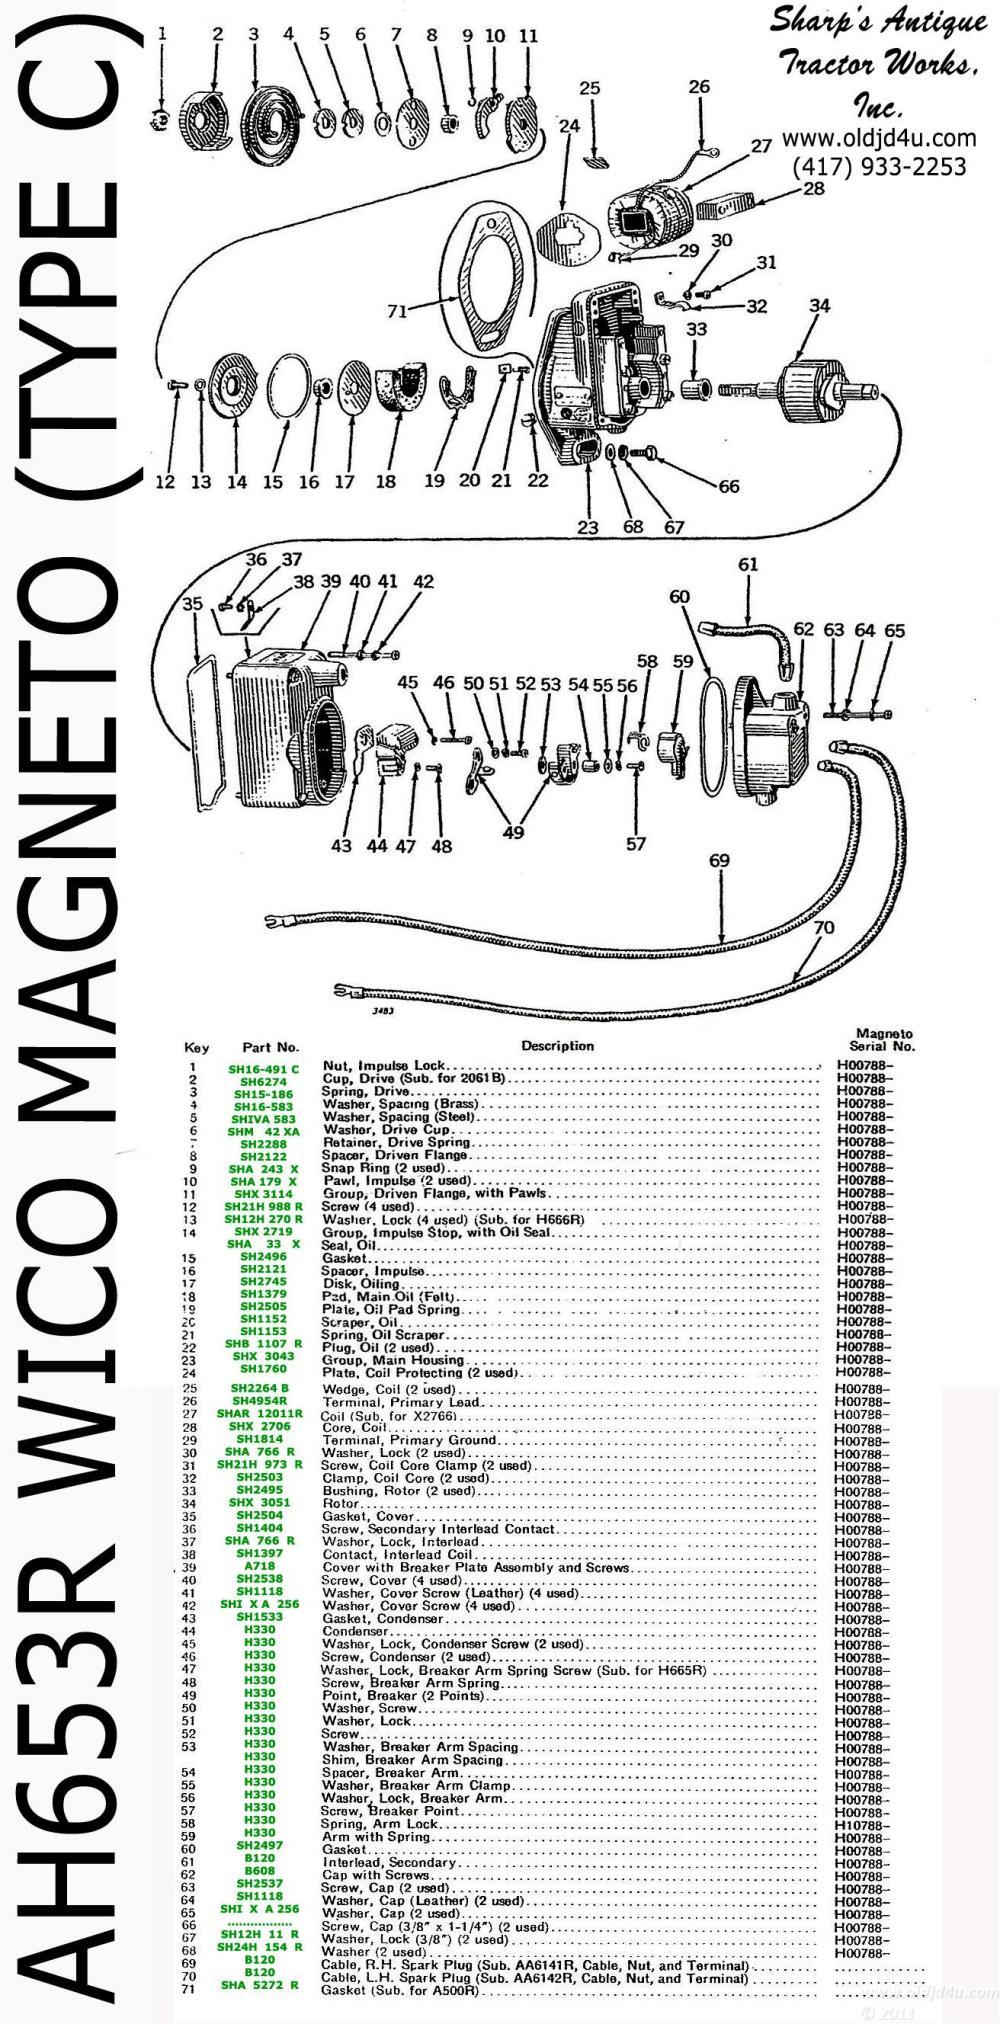 medium resolution of wico magneto diagram wiring schematic data rh 57 american football ausruestung de vw coil wiring with